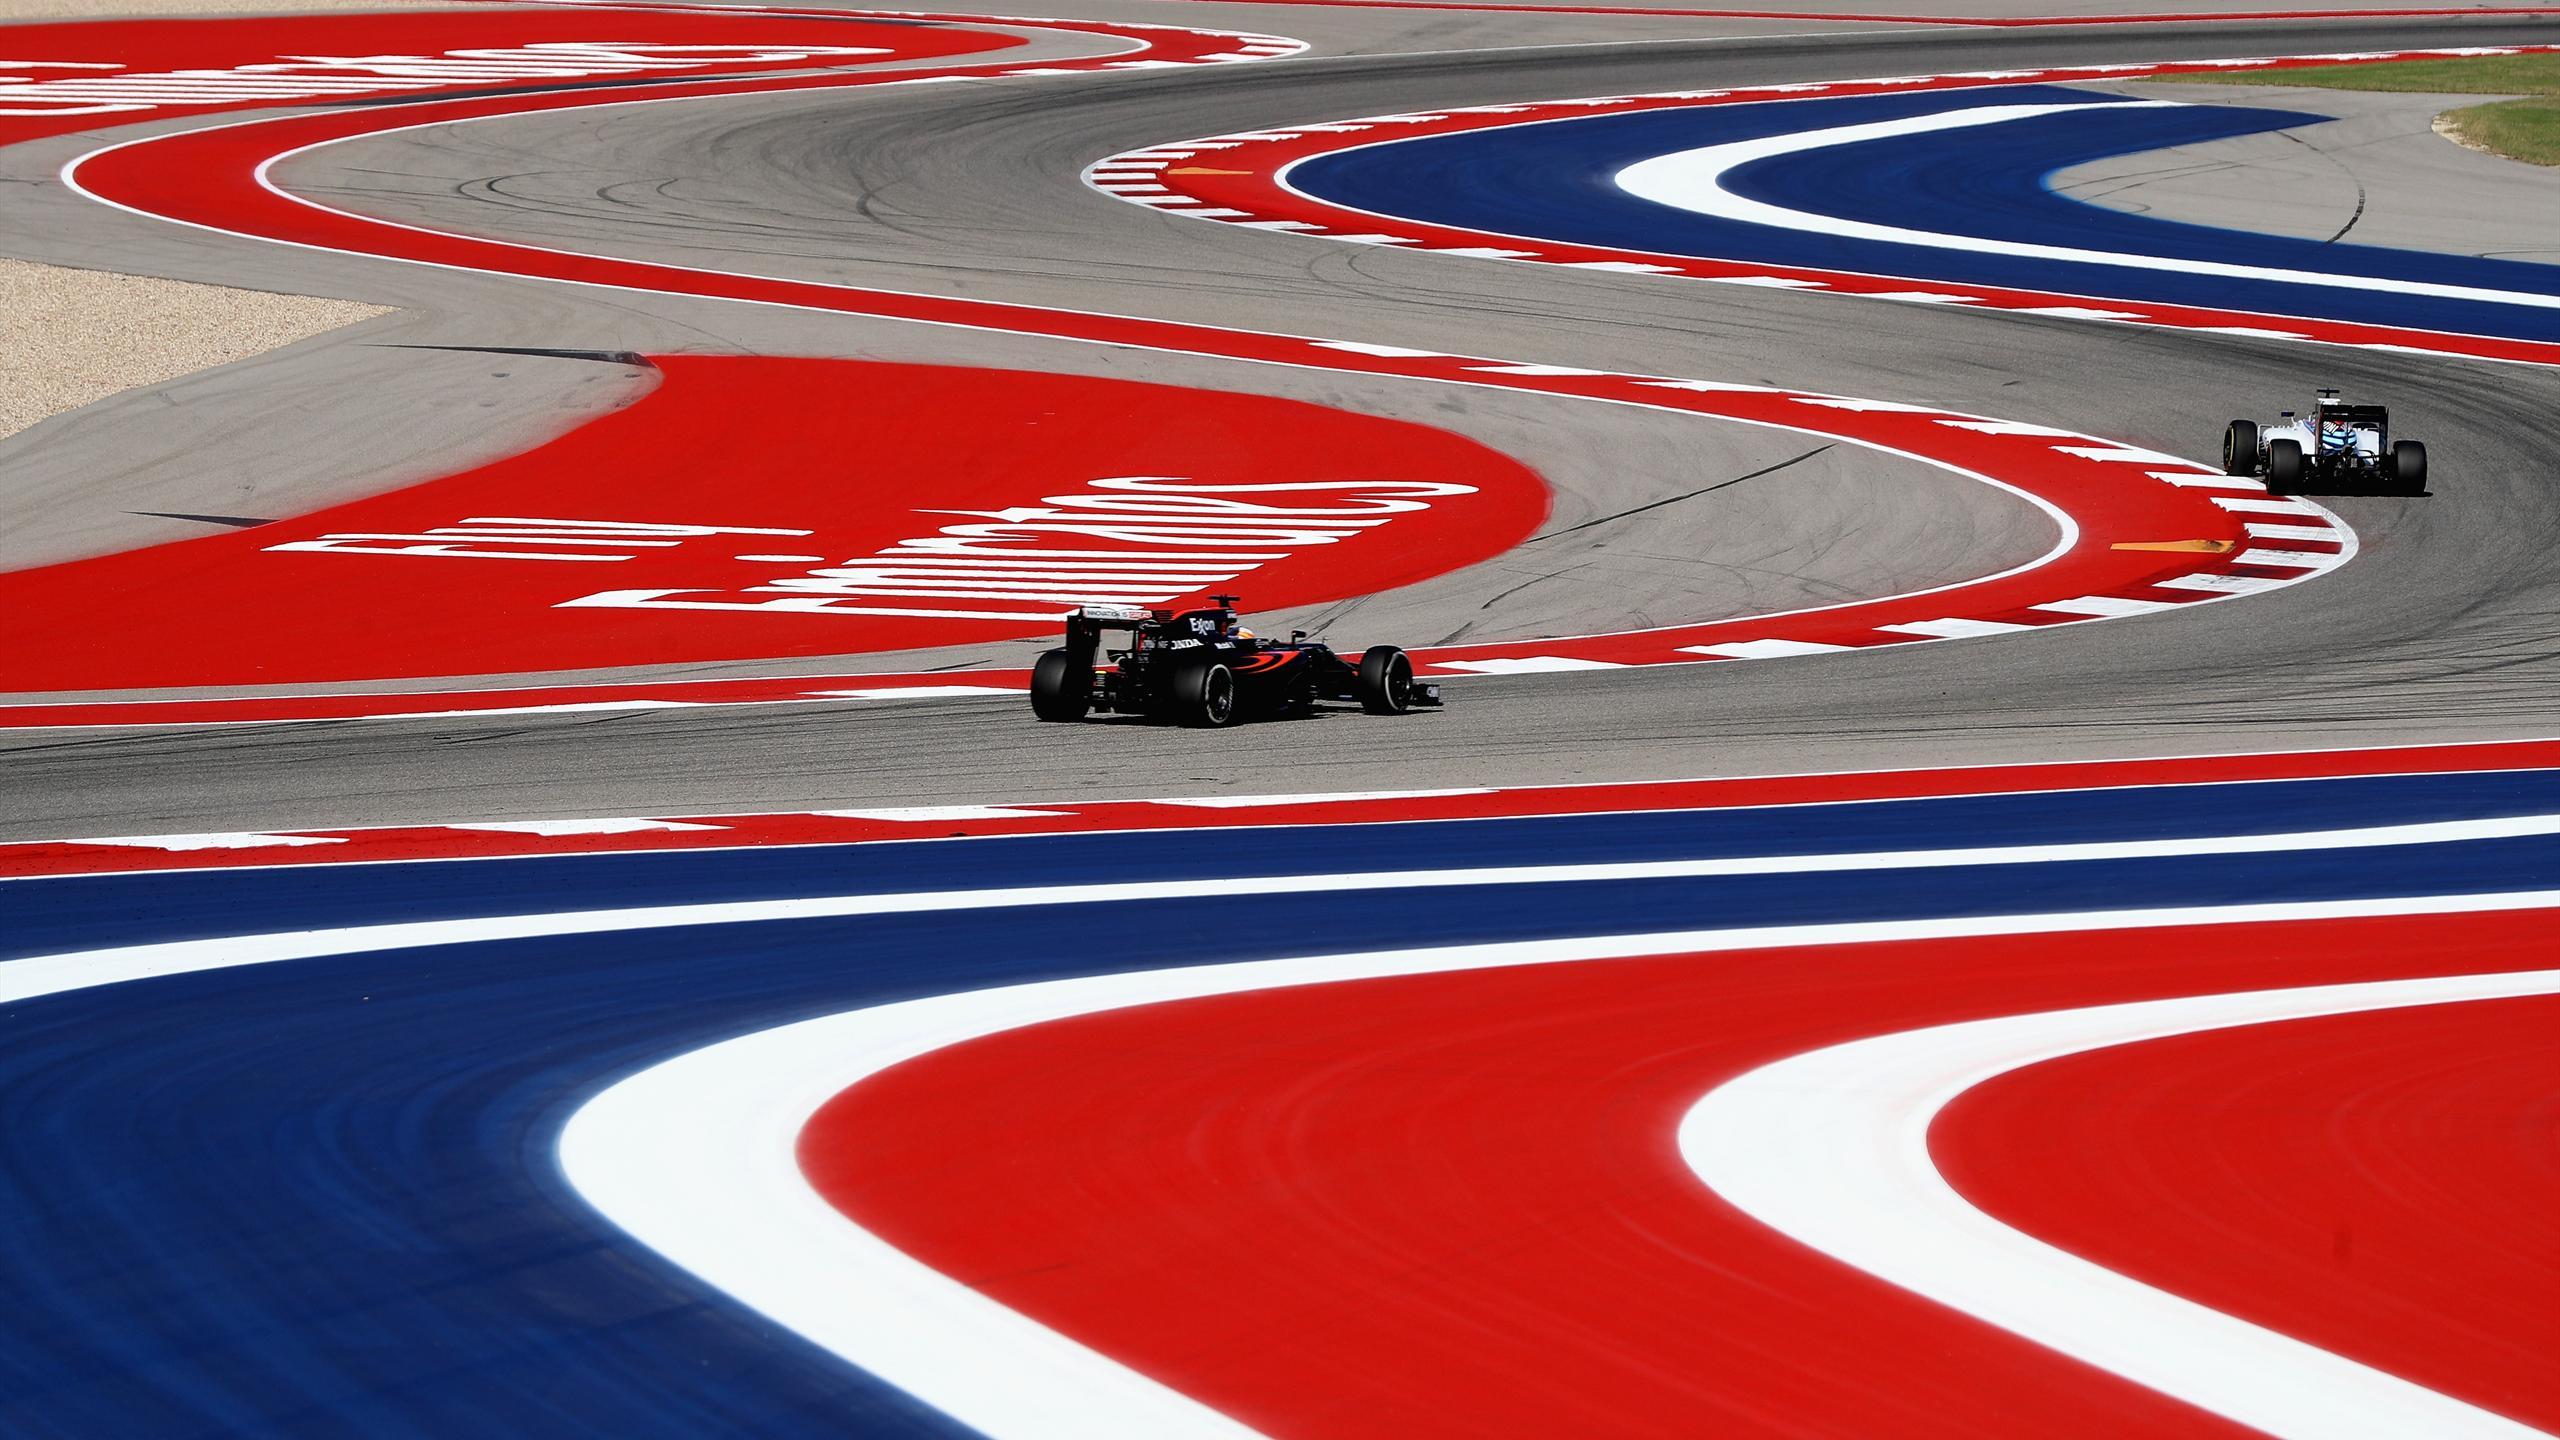 Fernando Alonso (McLaren) - GP of United States of America 2016